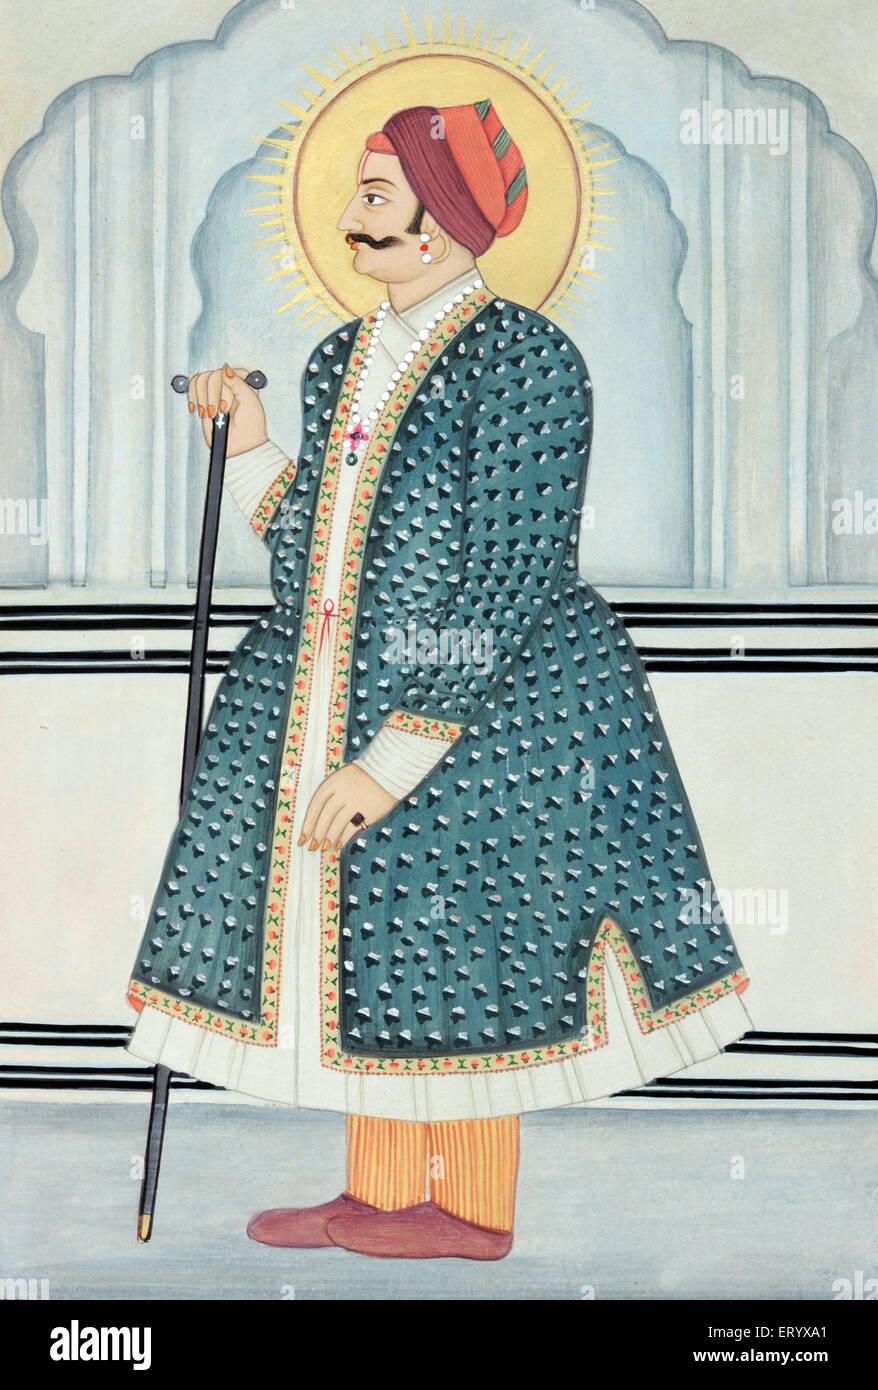 Miniature painting of Maharaja Sawai Jai Singh two Jaipur - Stock Image